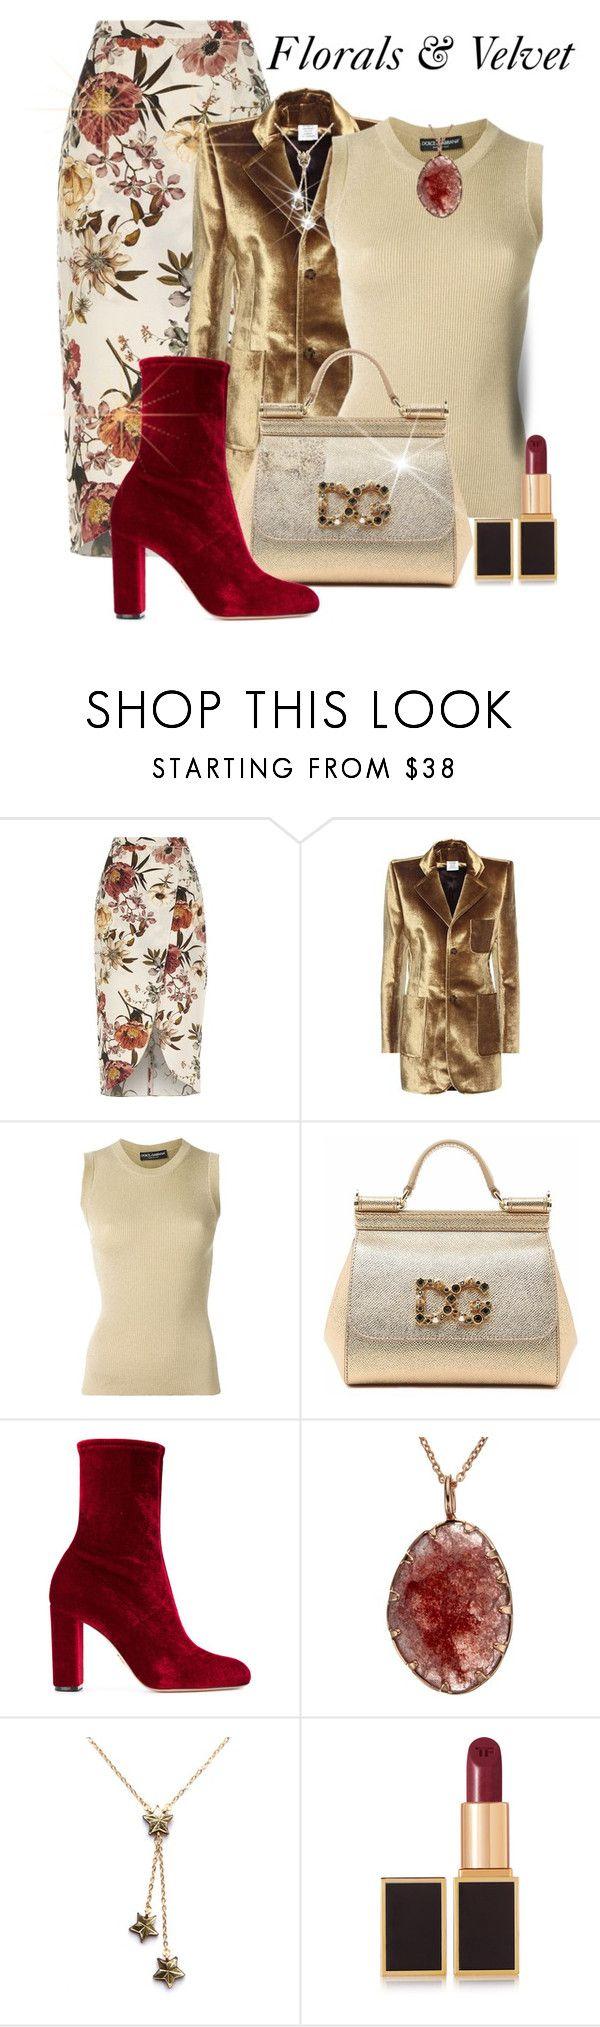 """Fall Trends"" by shamrockclover ❤ liked on Polyvore featuring River Island, Vetements, Dolce&Gabbana, Oscar Tiye, Rosita Bonita and Tom Ford"